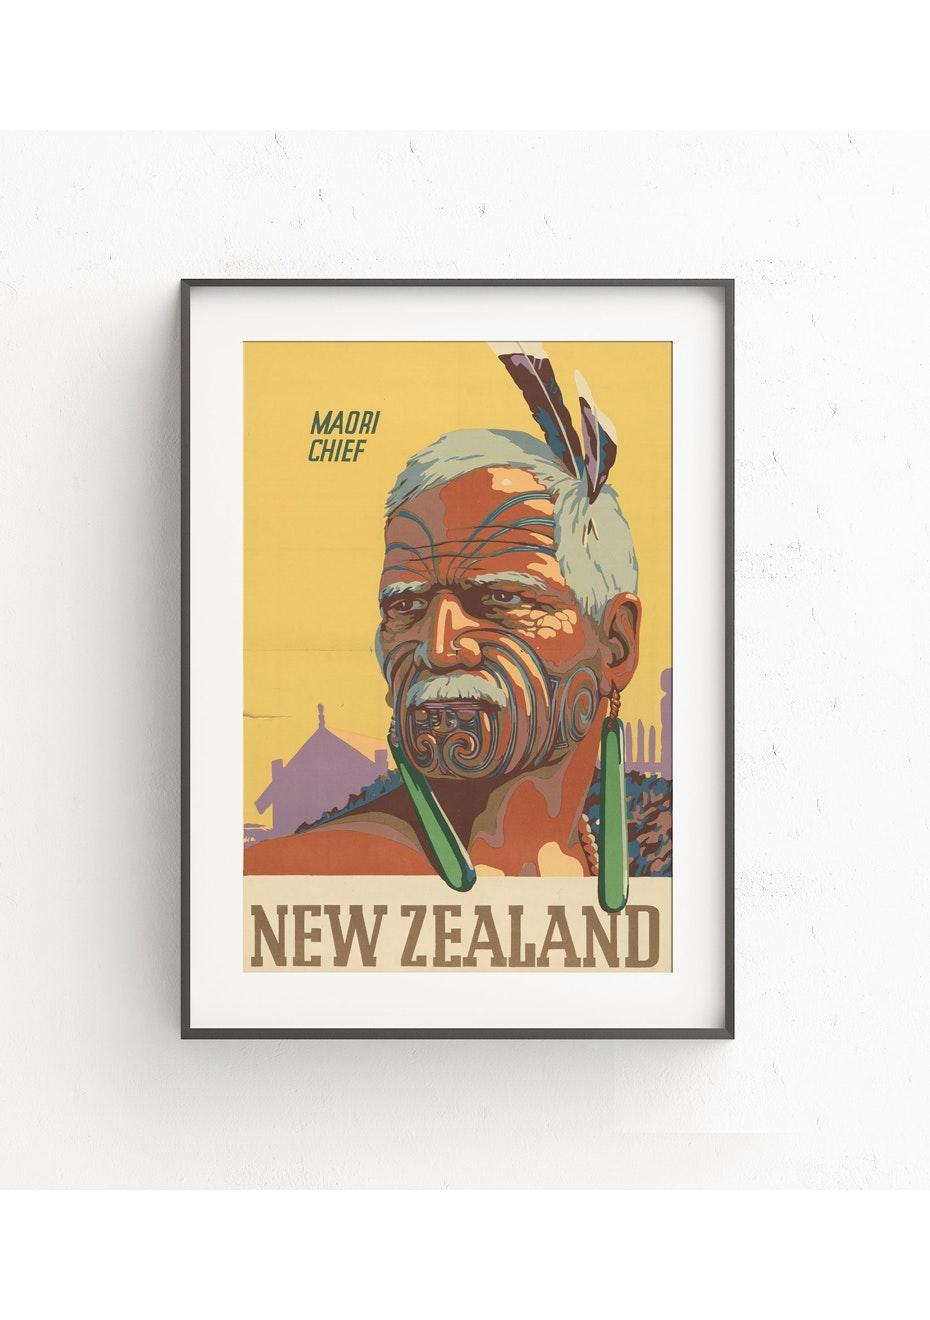 Maori Chief Vintage Tourist Print - A2